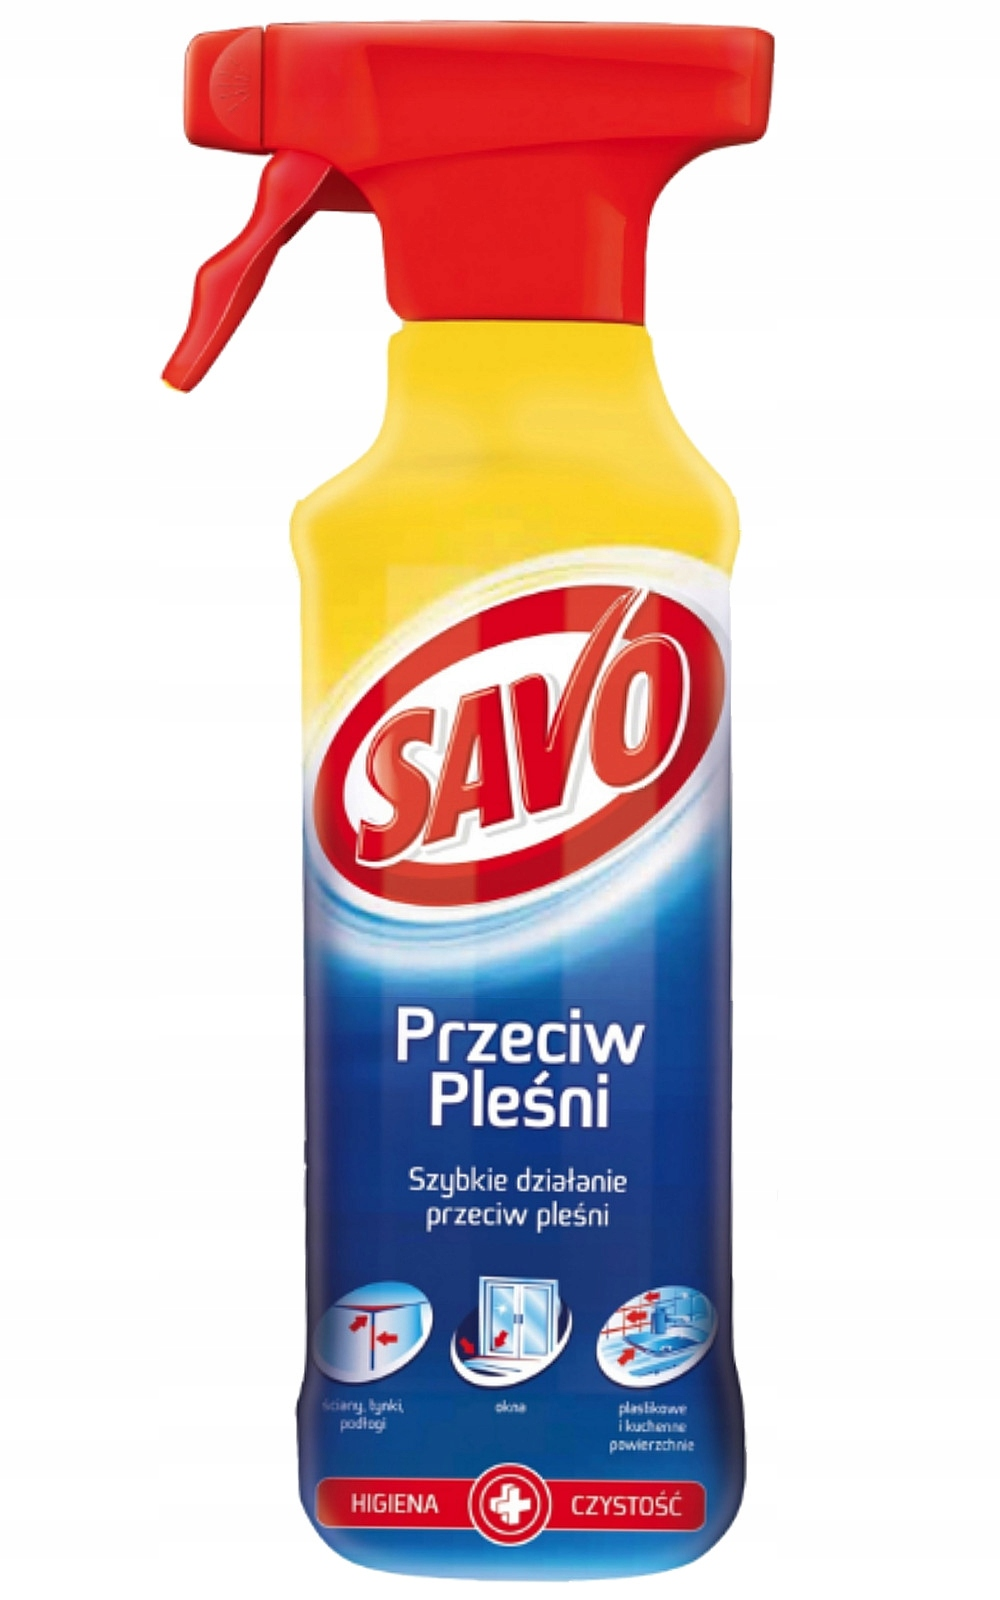 Savo Спрей Очистка для плесени грибы Спрей 500мл